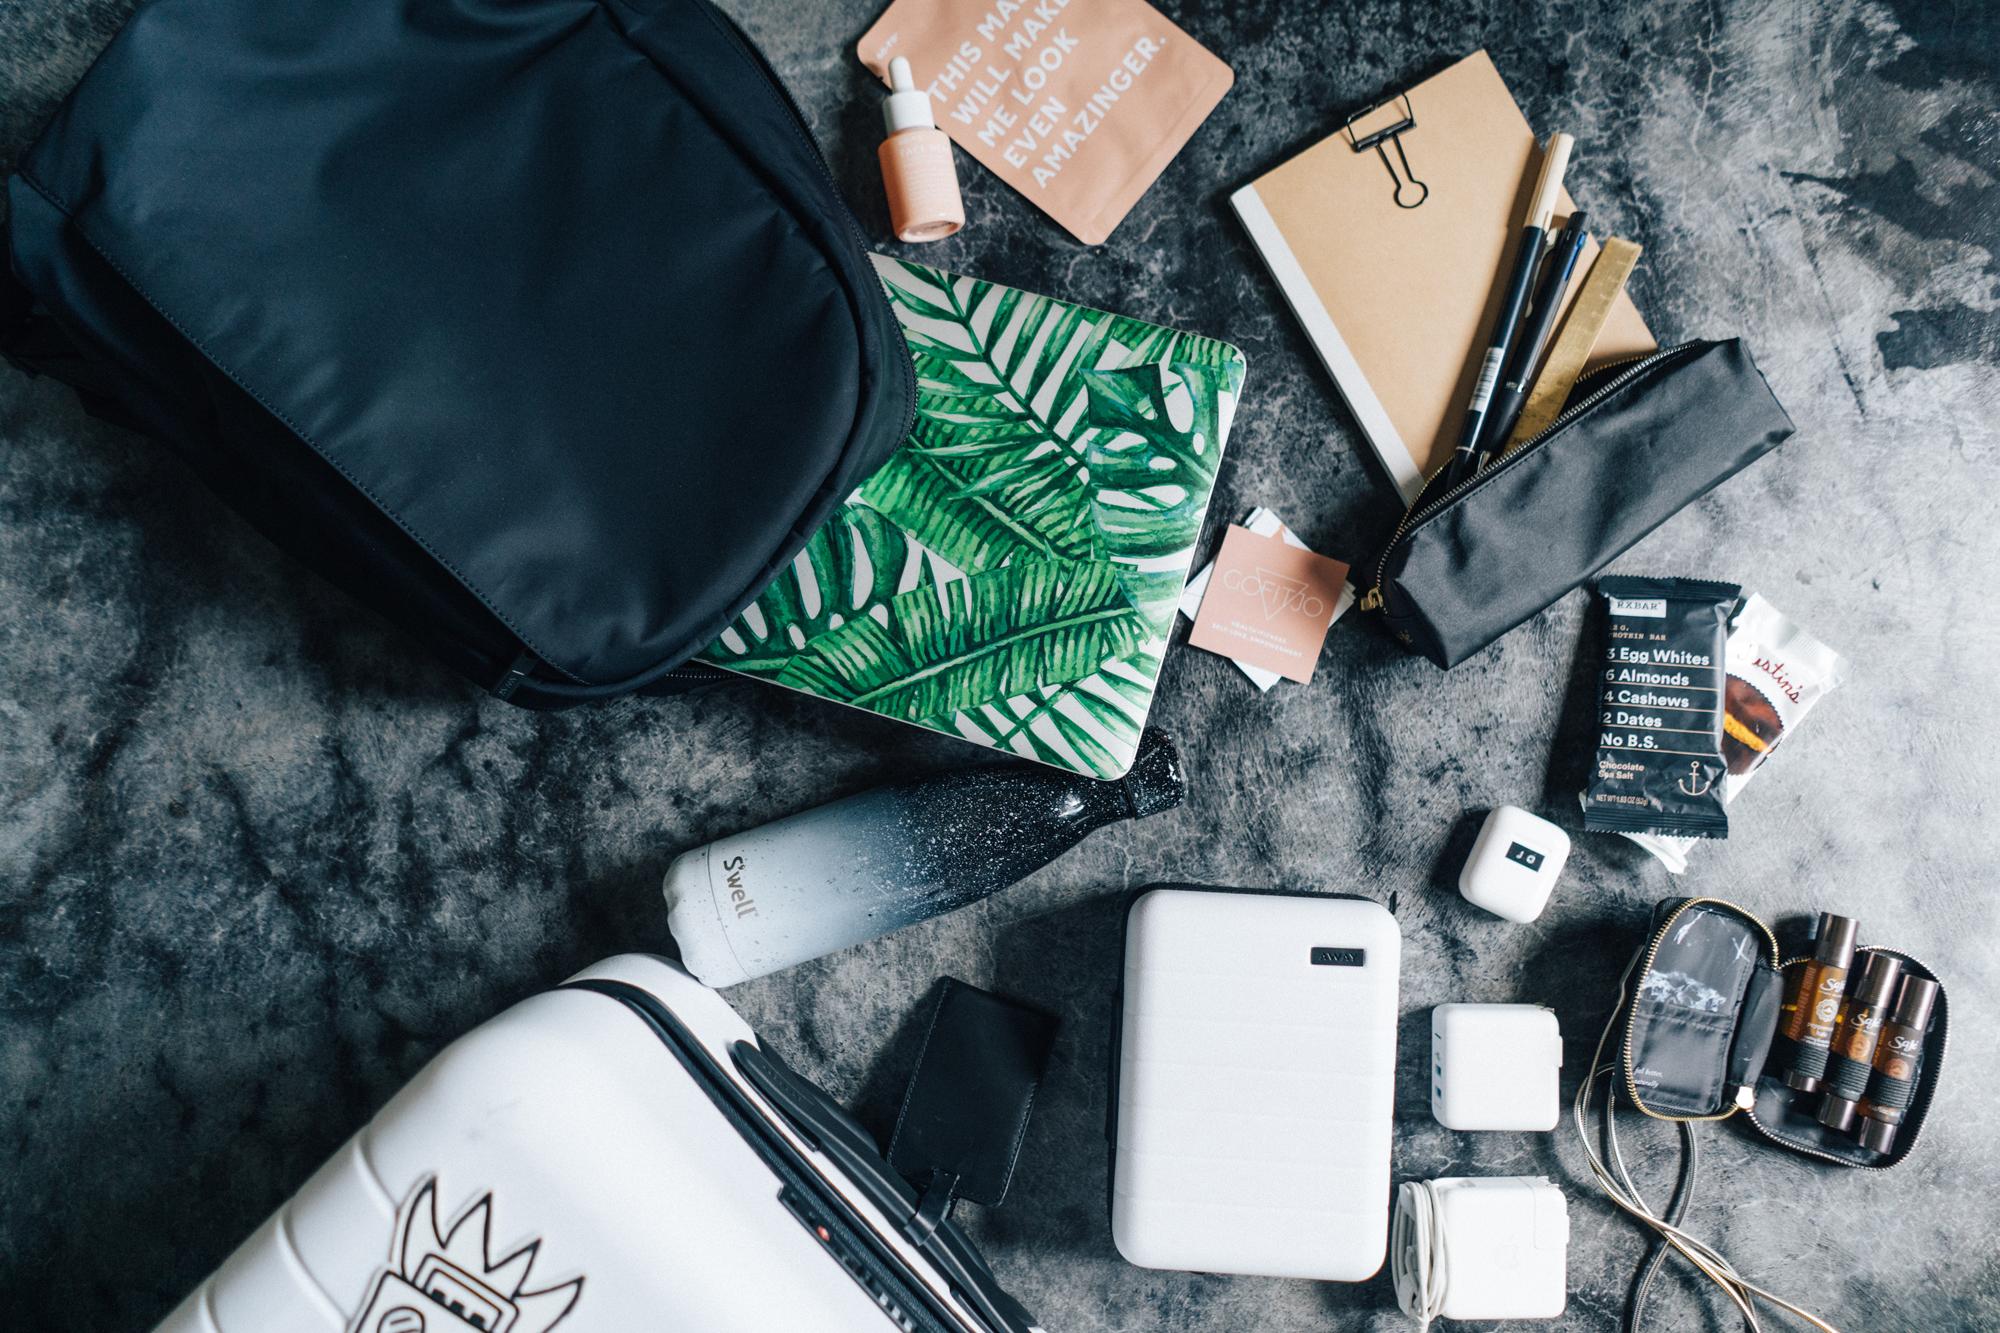 #WHATSINMYBAG - my travel essentials